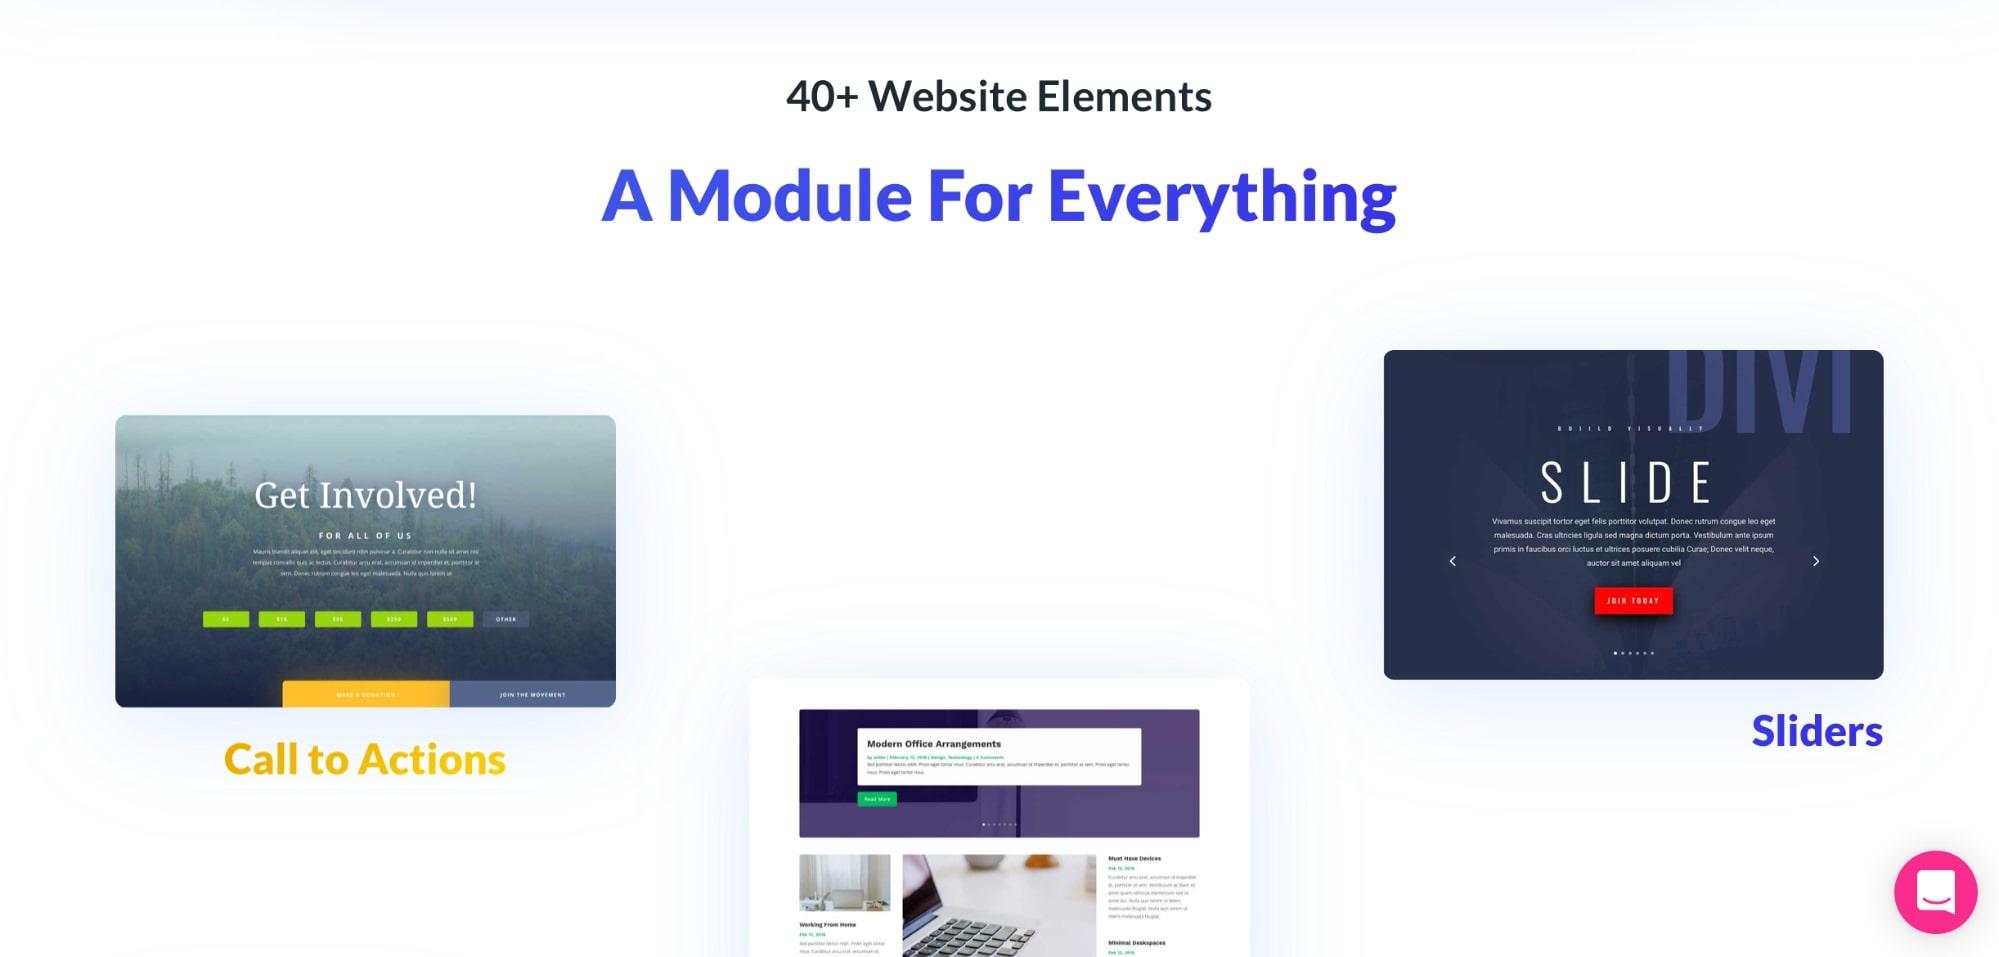 Content Modules of Divi theme